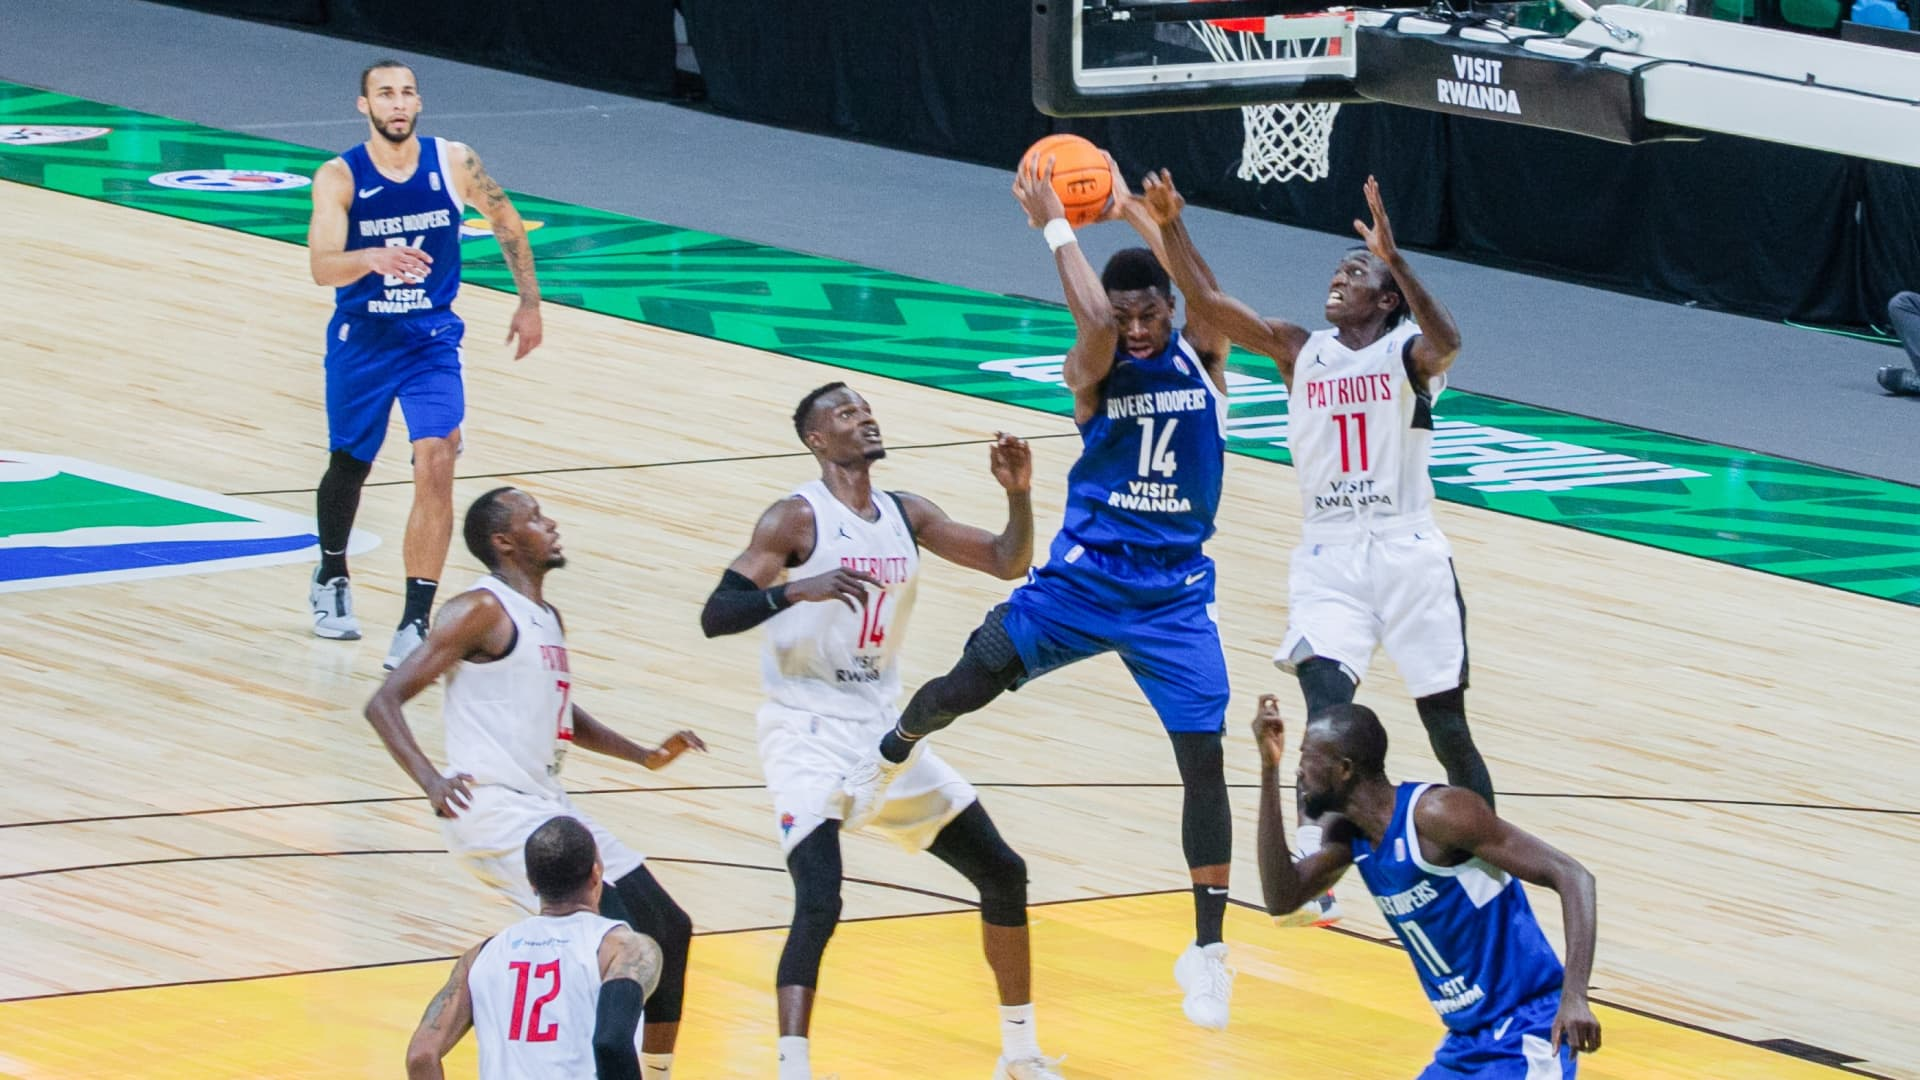 Benjamin Chukwukelo Uzoh 2nd R of Rivers Hoopers of Nigeria vies with Wilson Nshobozwa of Patriots Rwanda during the opening game of the the inaugural Basketball Africa League BAL in Kigali, capital city of Rwanda, May 16, 2021.